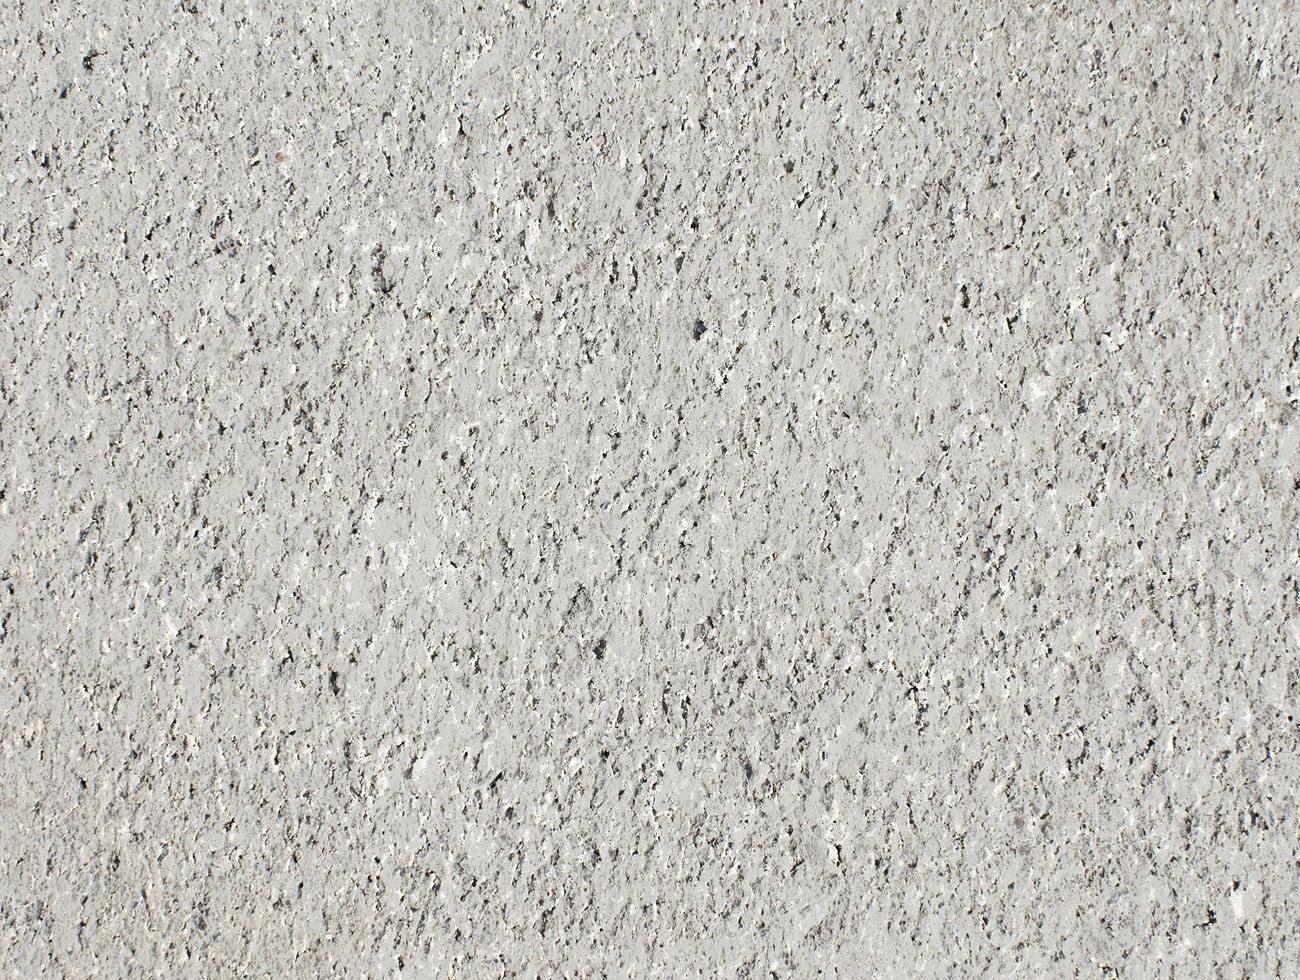 granieten muur textuur foto